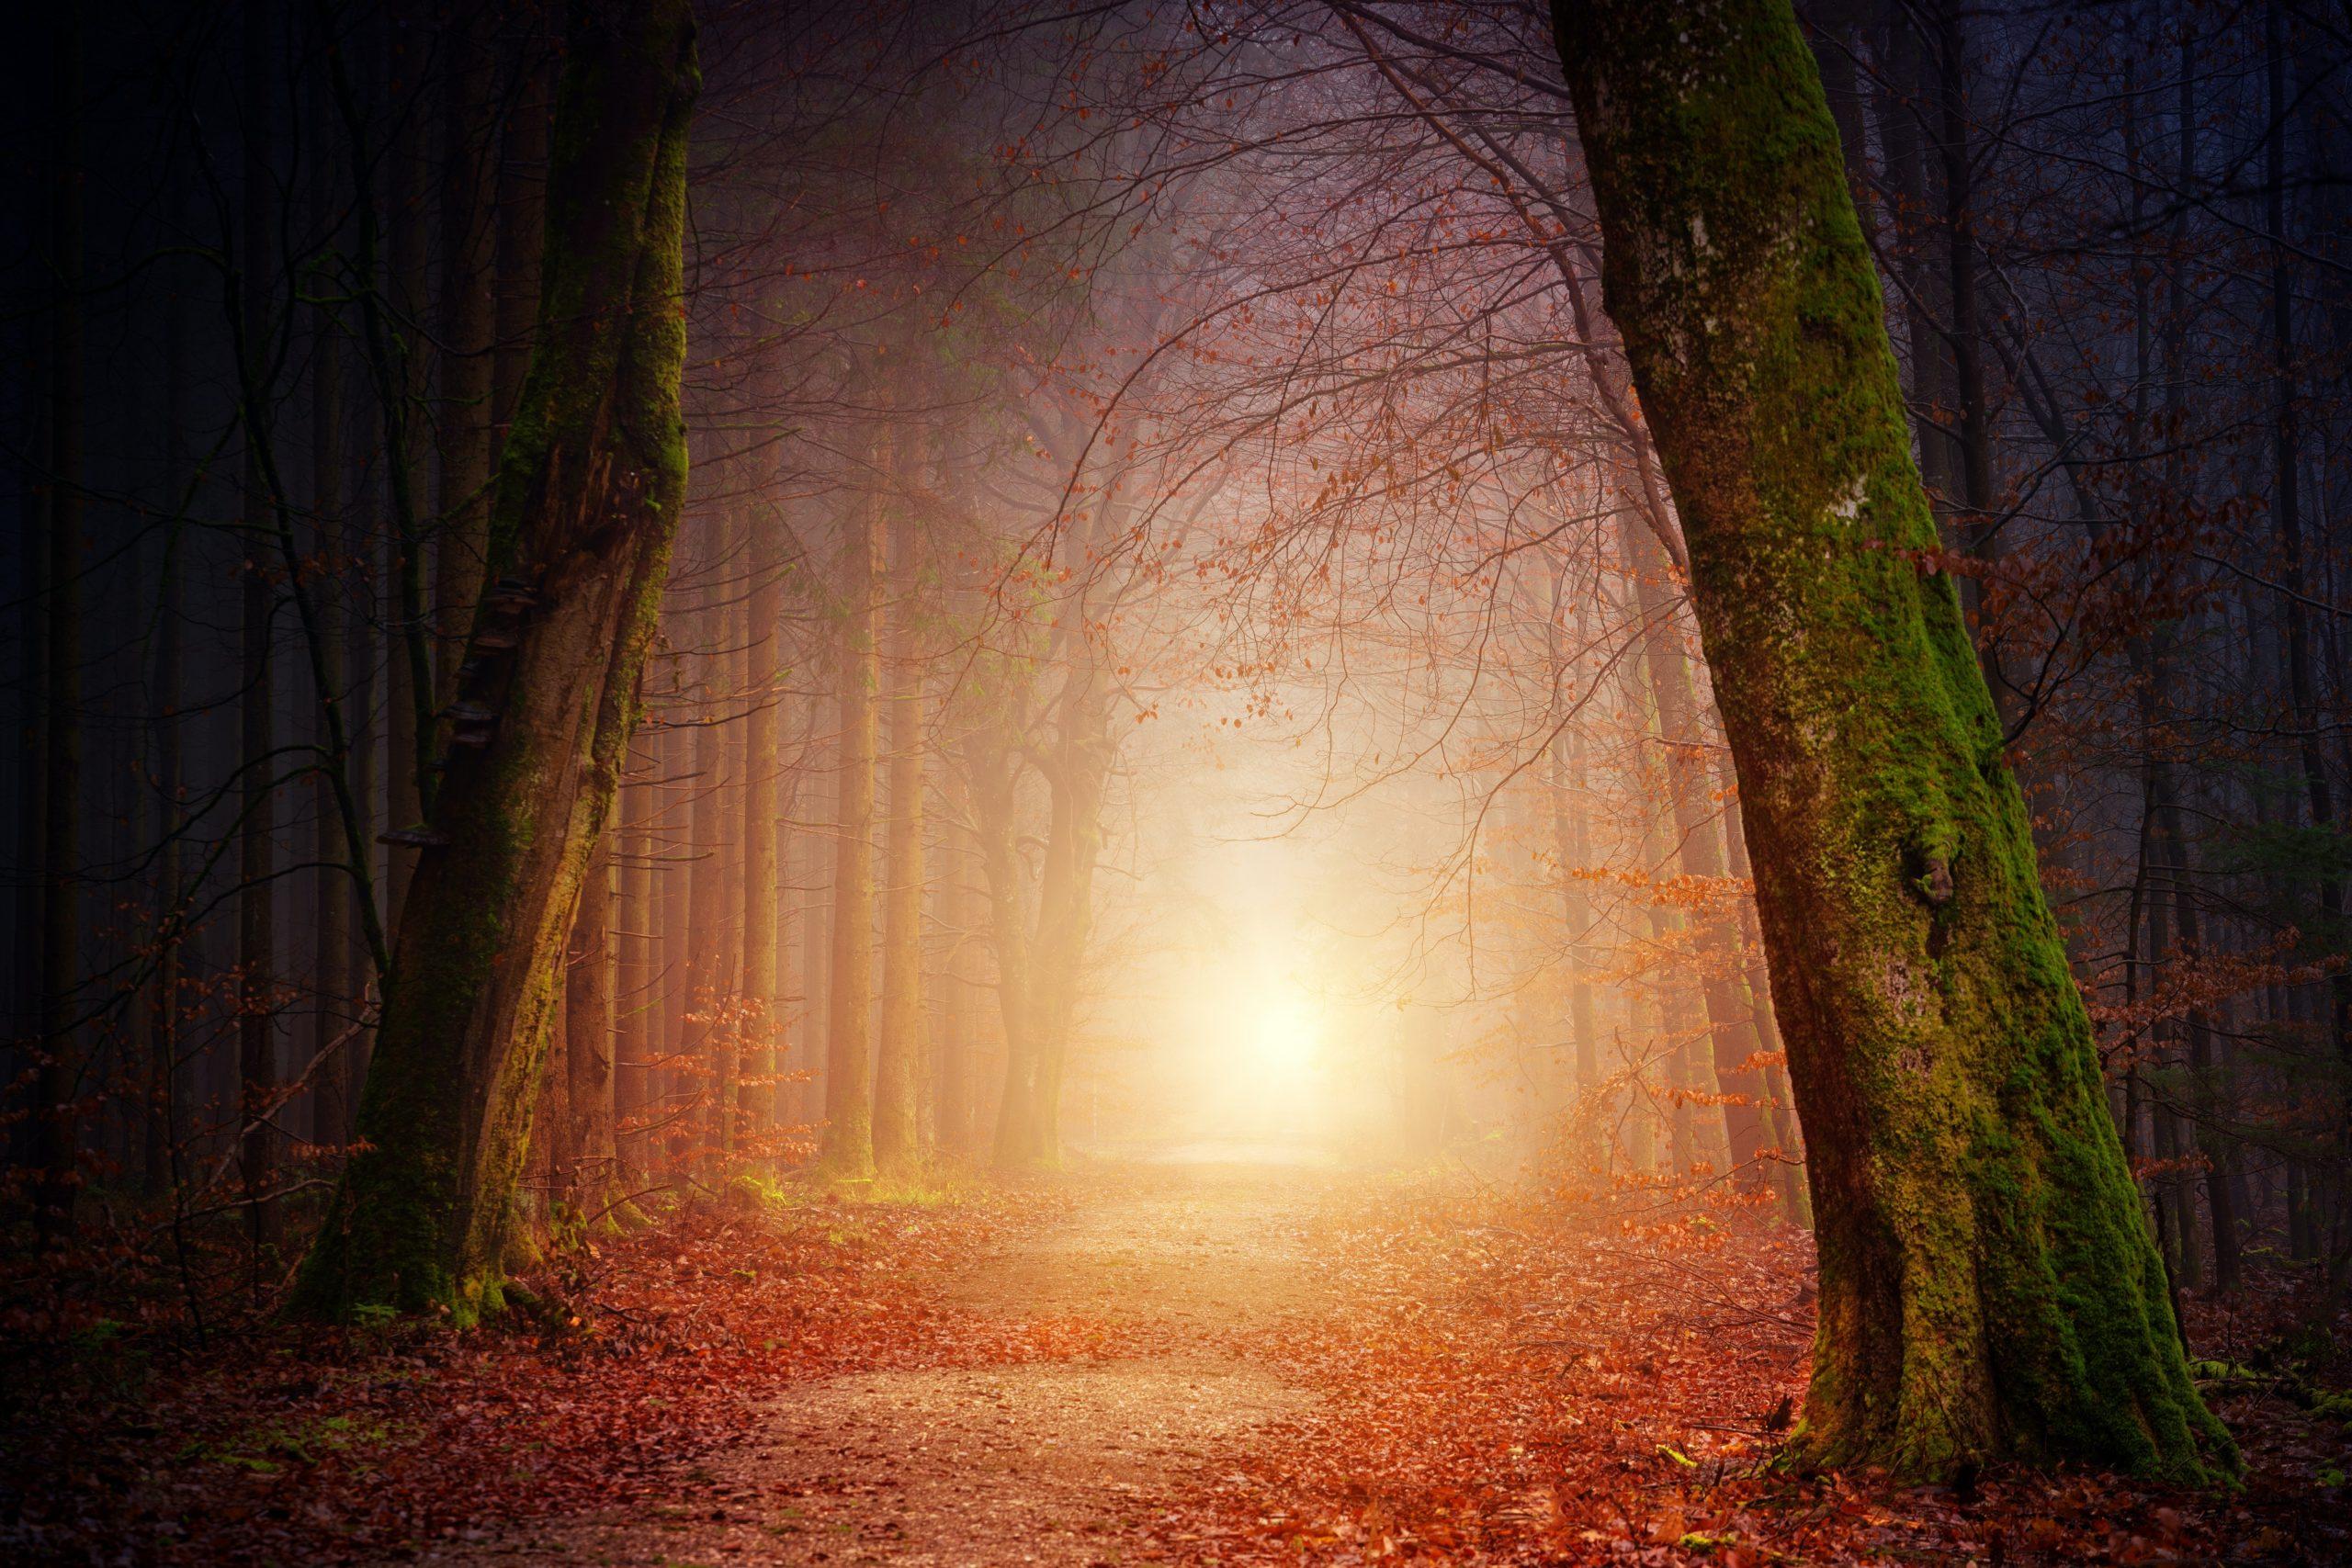 johannes-plenio-1vzLW-ihJaM-unsplash luce nel bosco